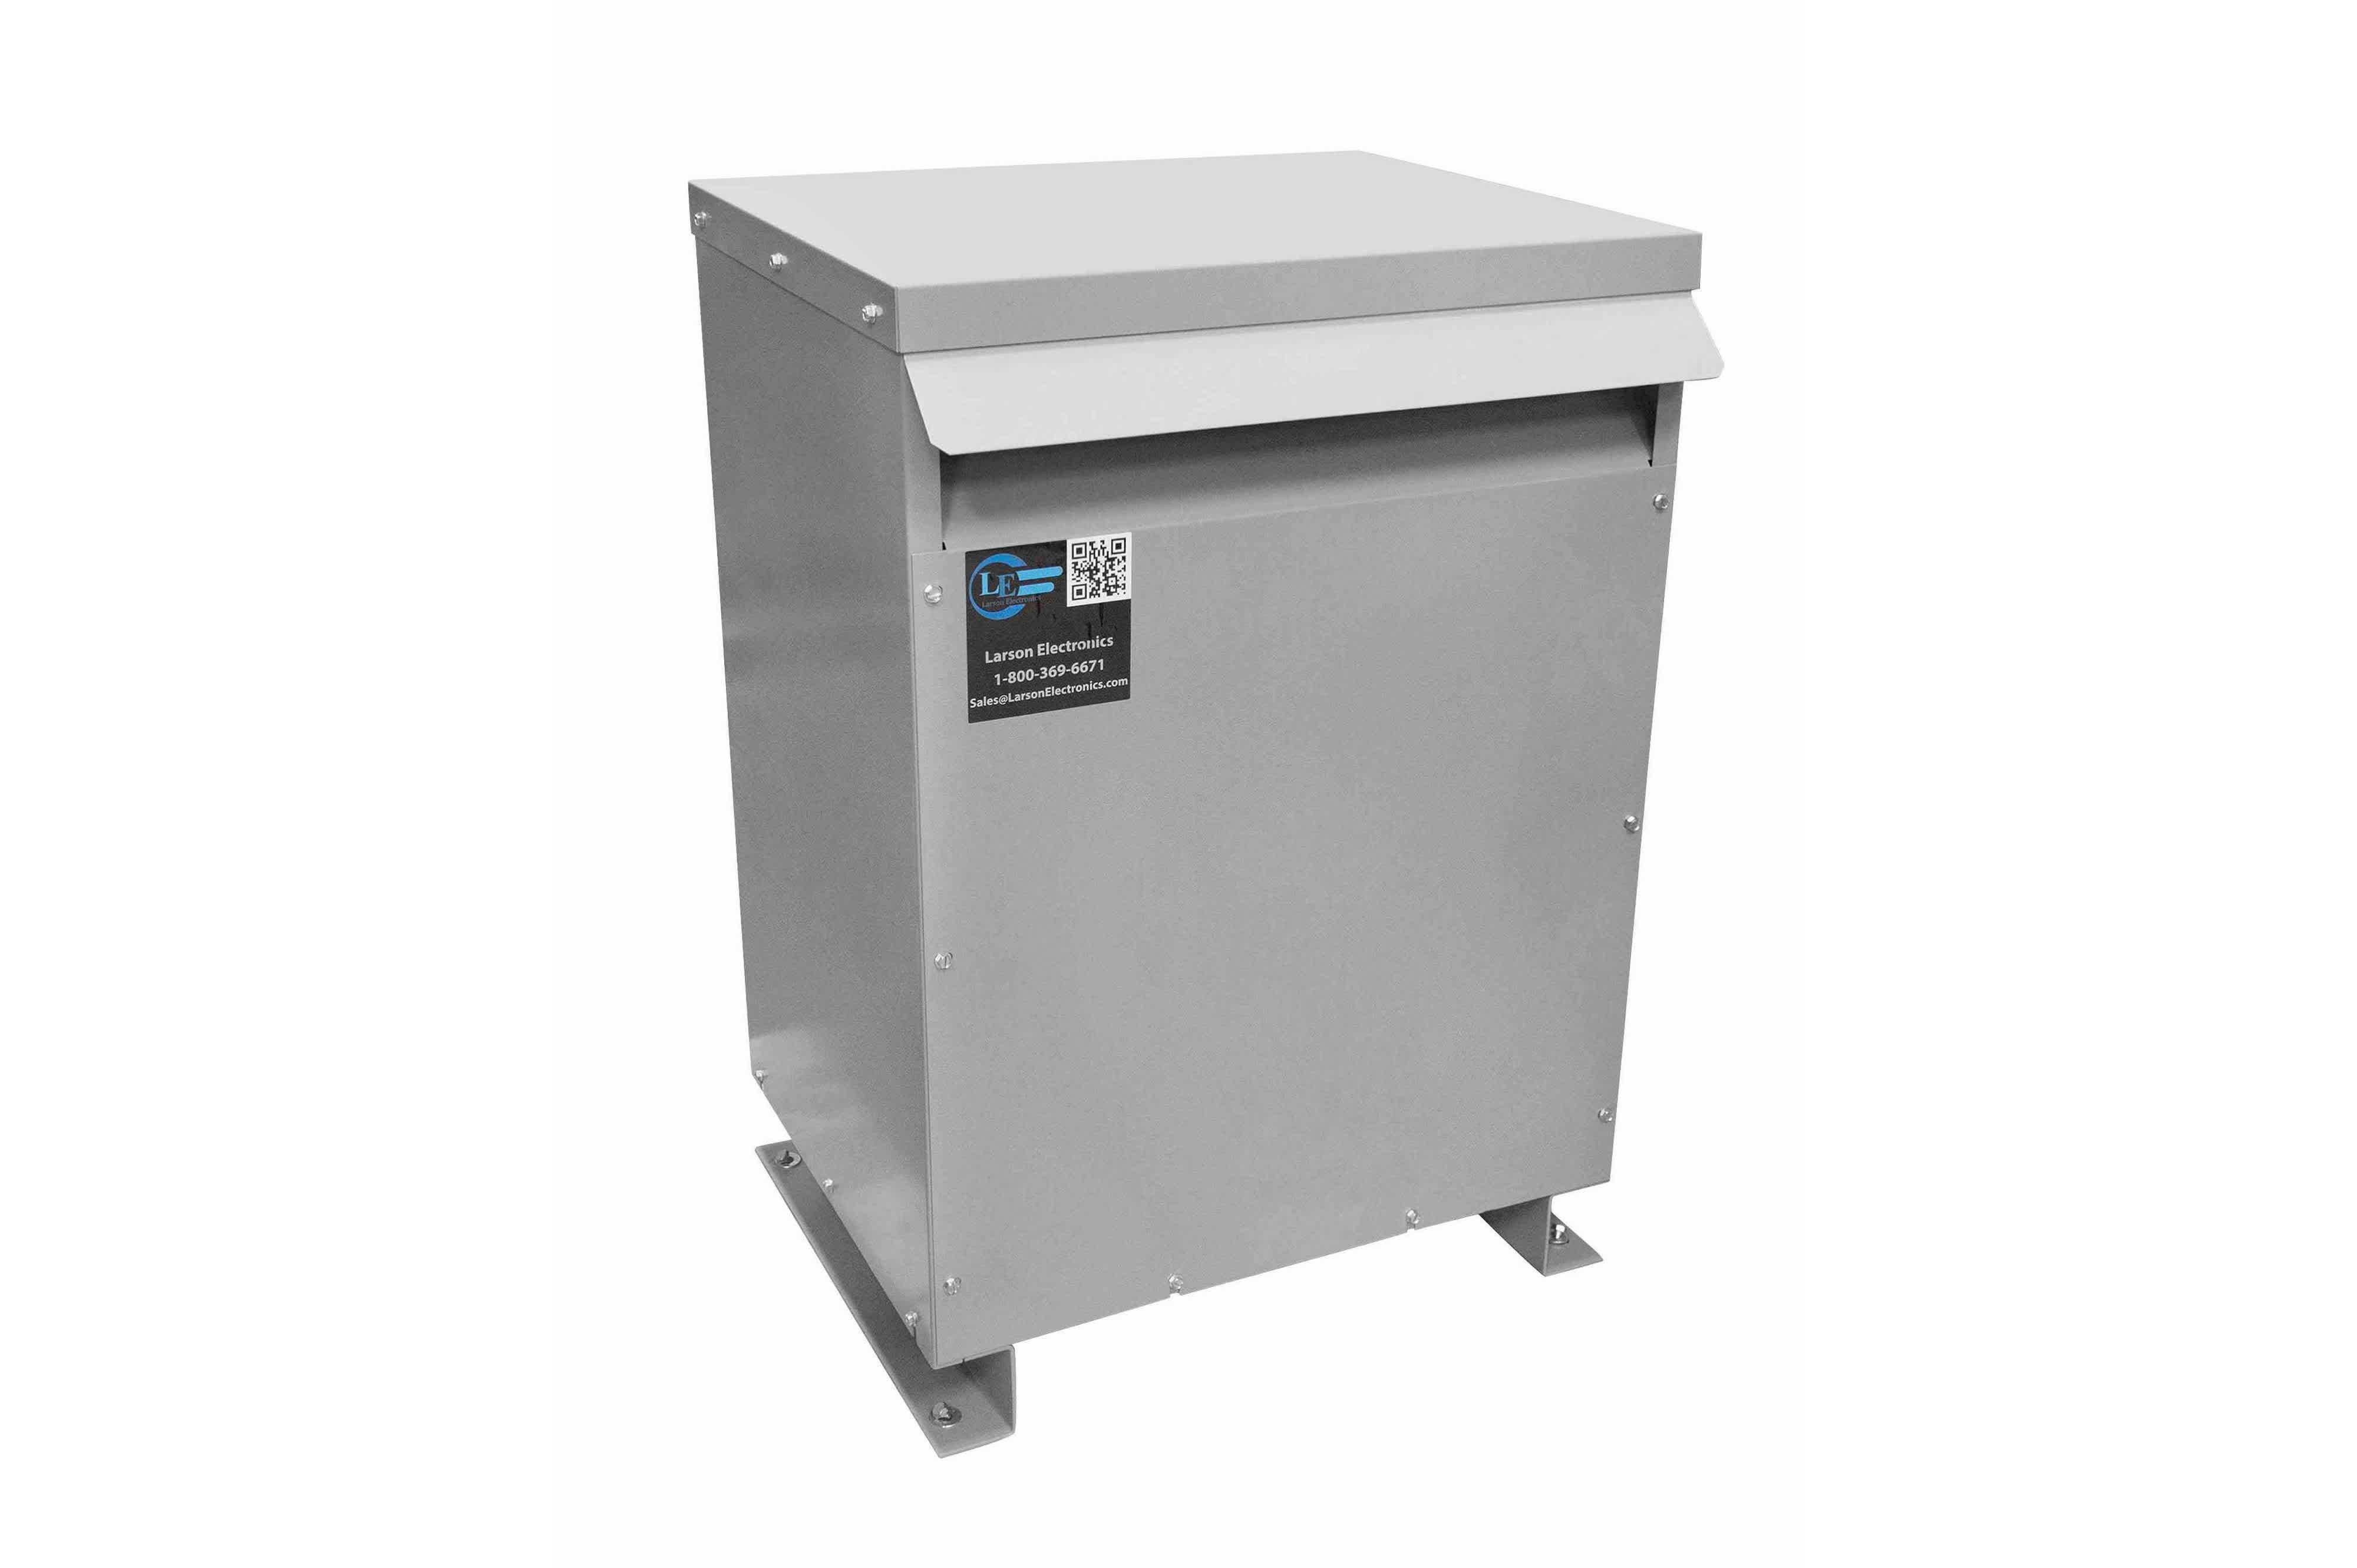 47.5 kVA 3PH Isolation Transformer, 415V Wye Primary, 480V Delta Secondary, N3R, Ventilated, 60 Hz